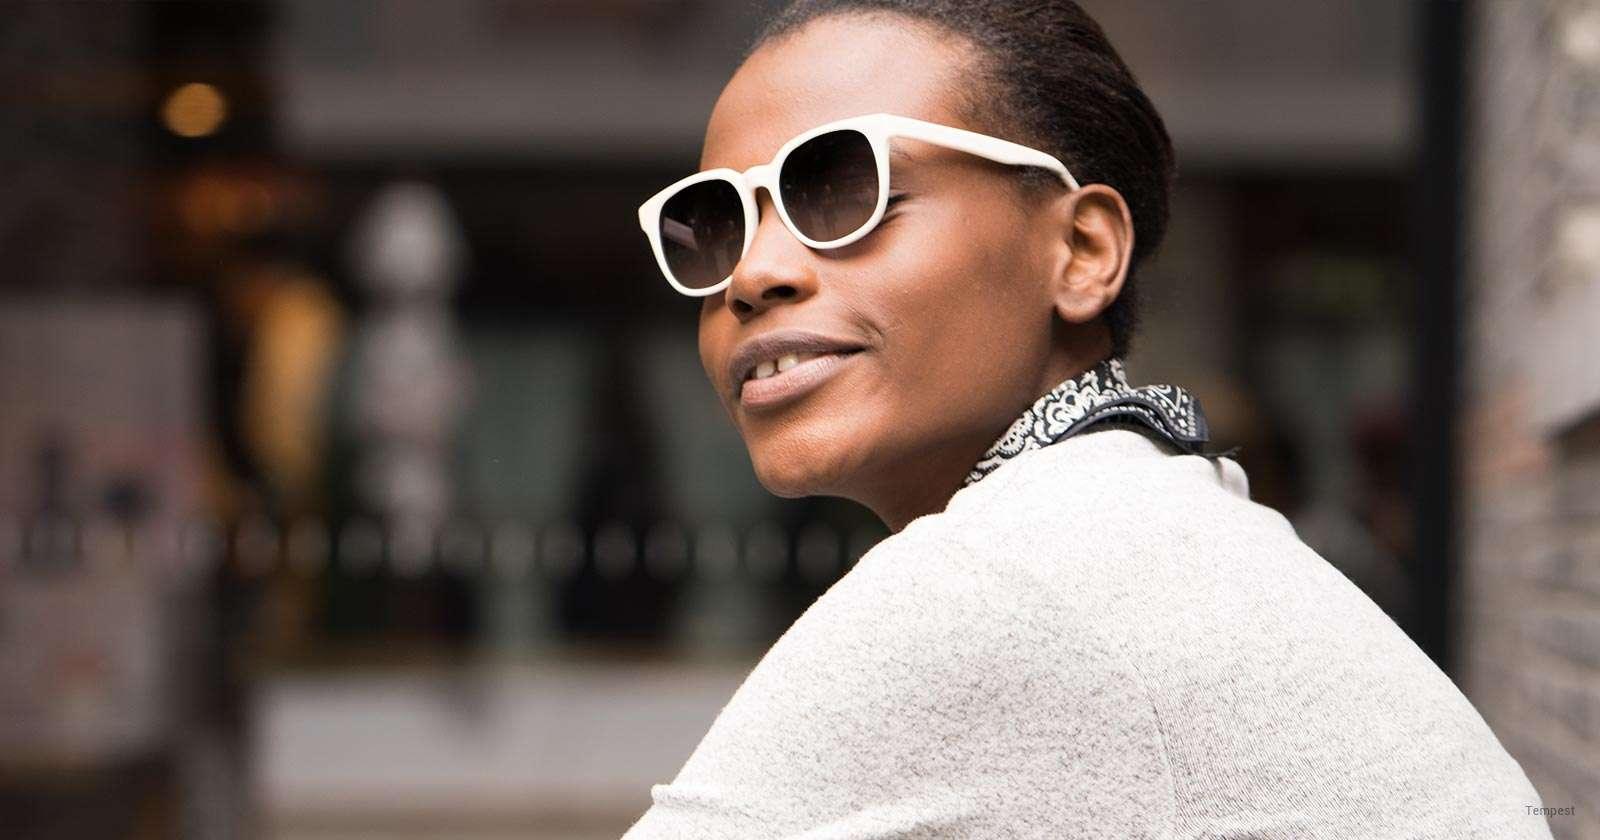 faaccfa17558 Why Gradient Polarized Sunglasses Are For You